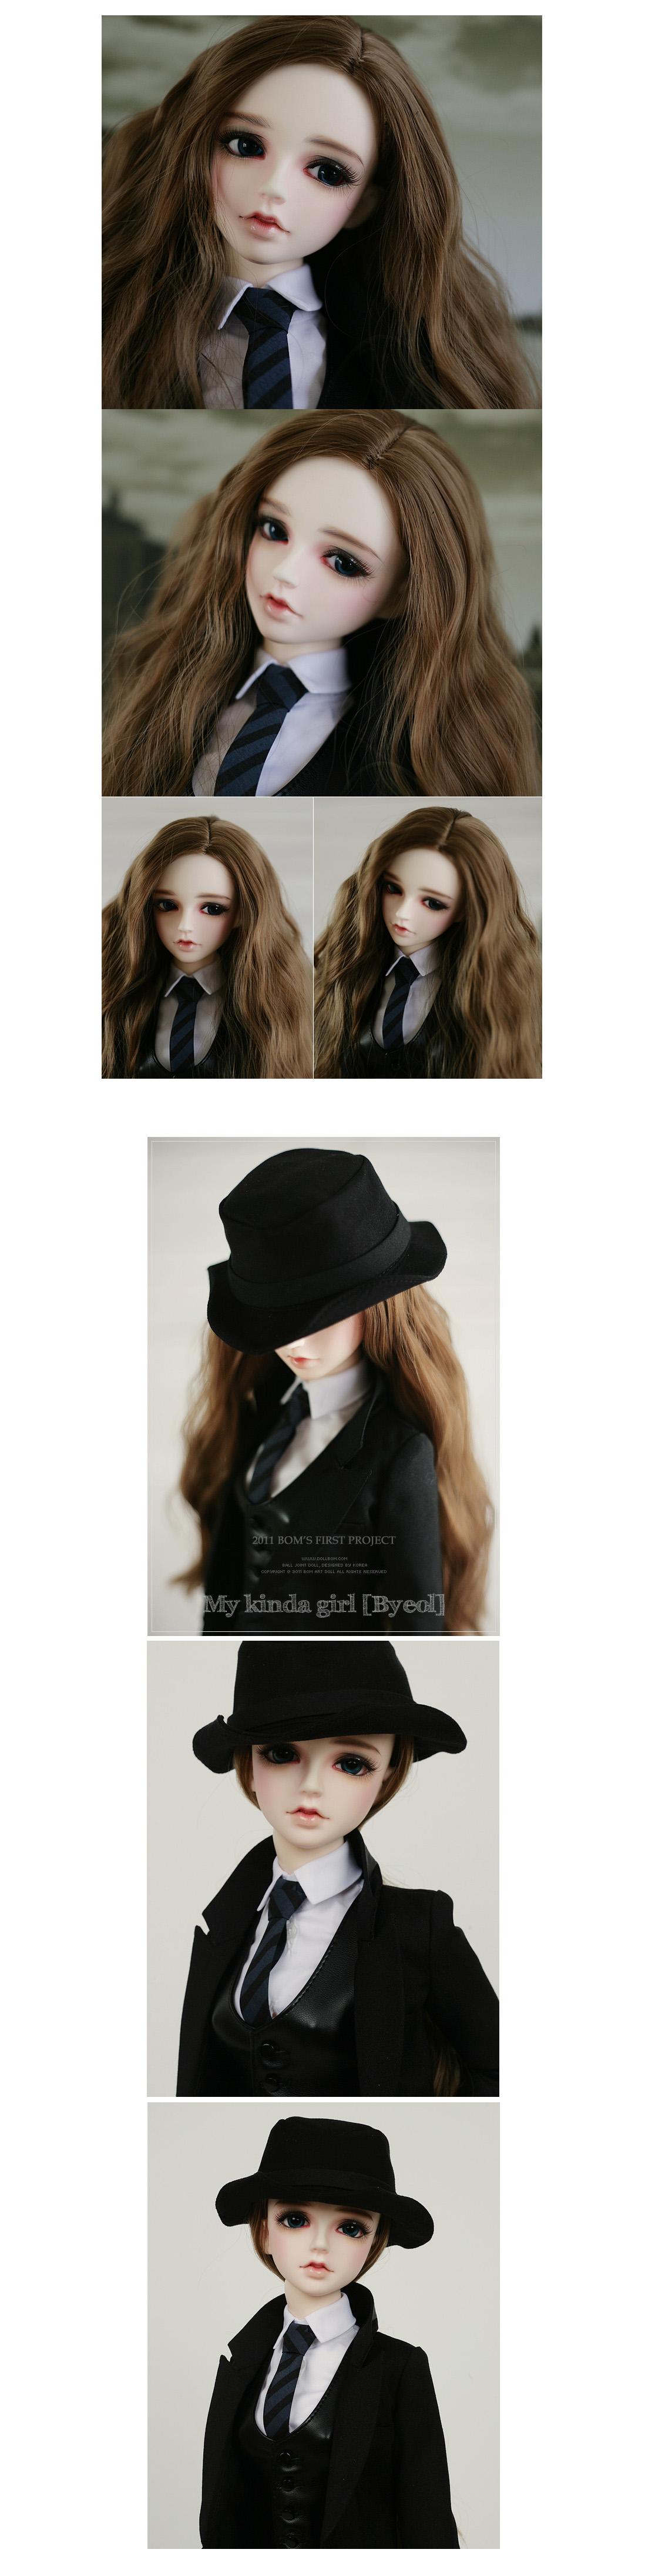 [Dollbom] Byeol My kinda girl - 60cm ball joint doll, sd